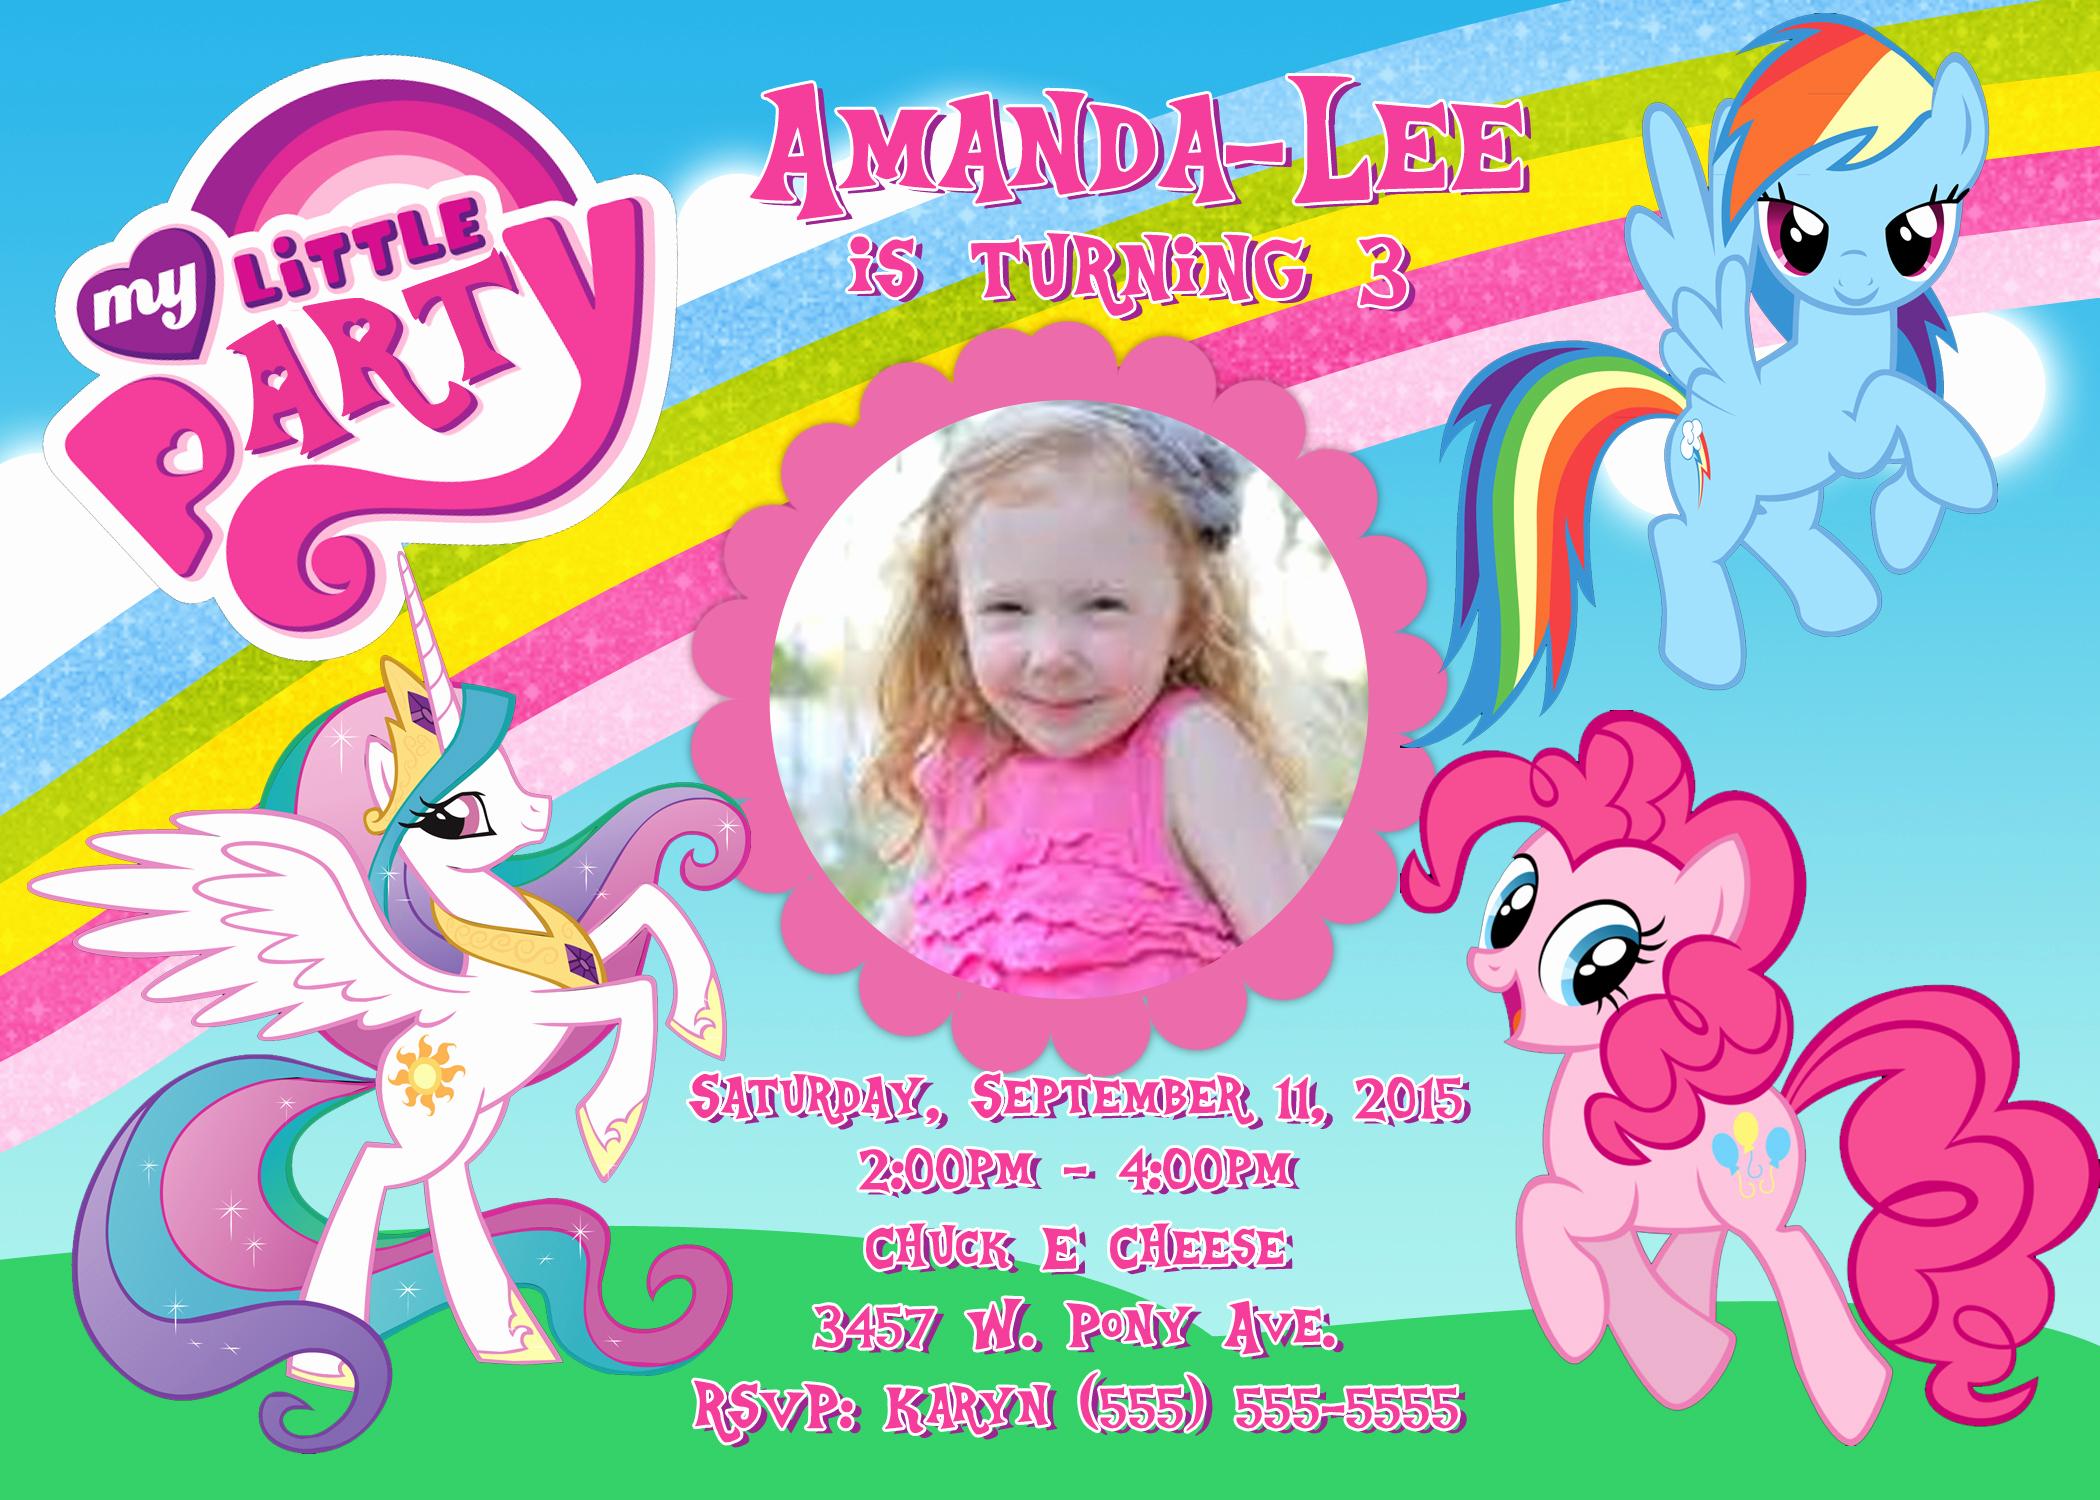 My Little Pony Invitation Ideas Unique My Little Pony Birthday Invitation